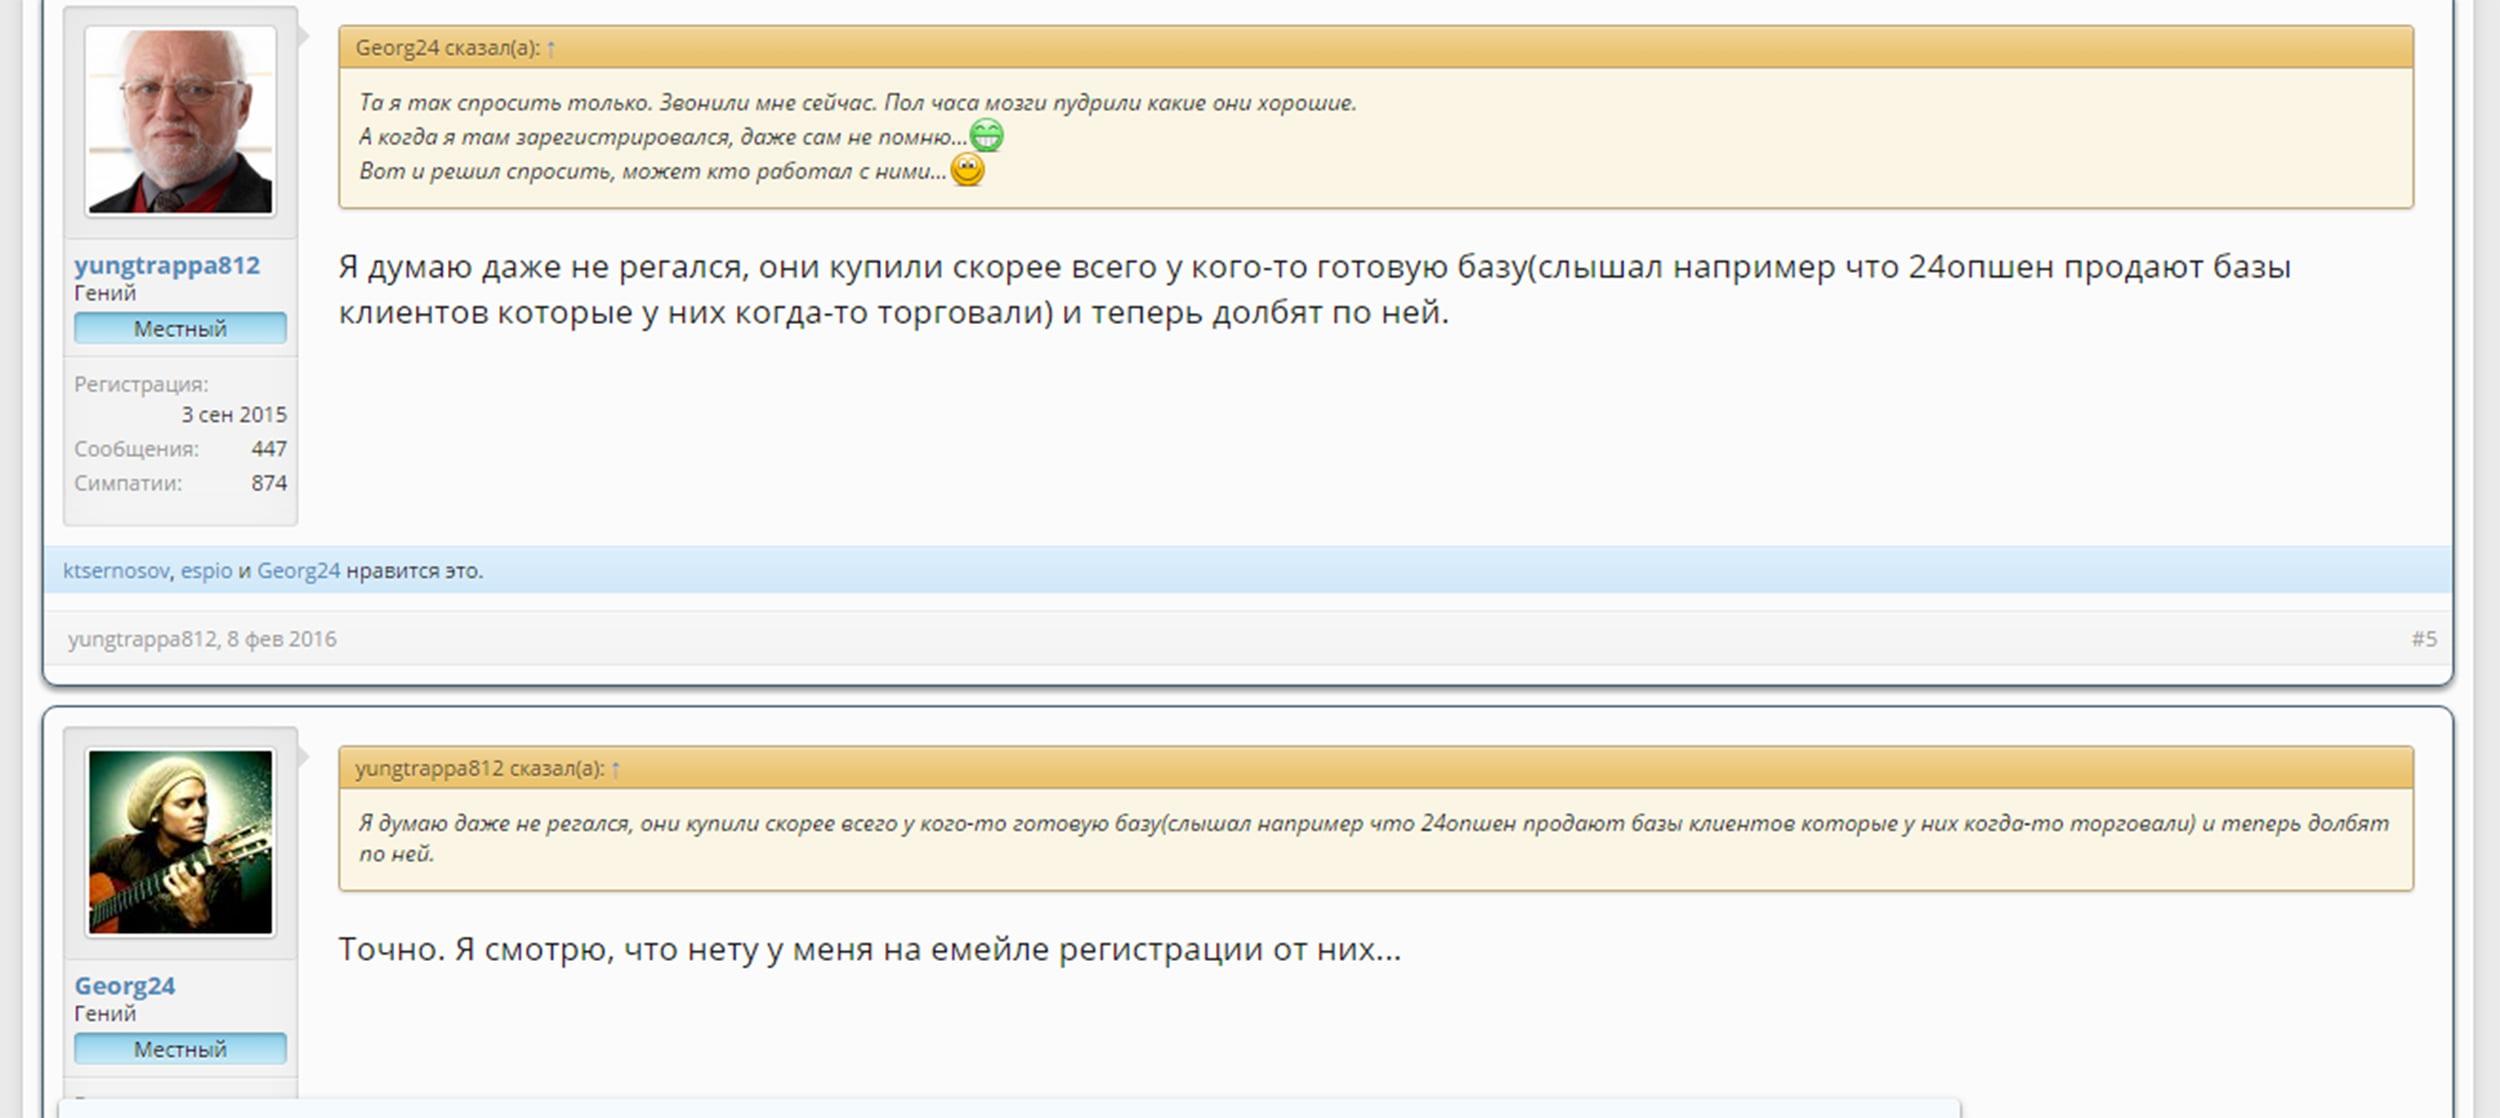 Отзывы о SuperBinary